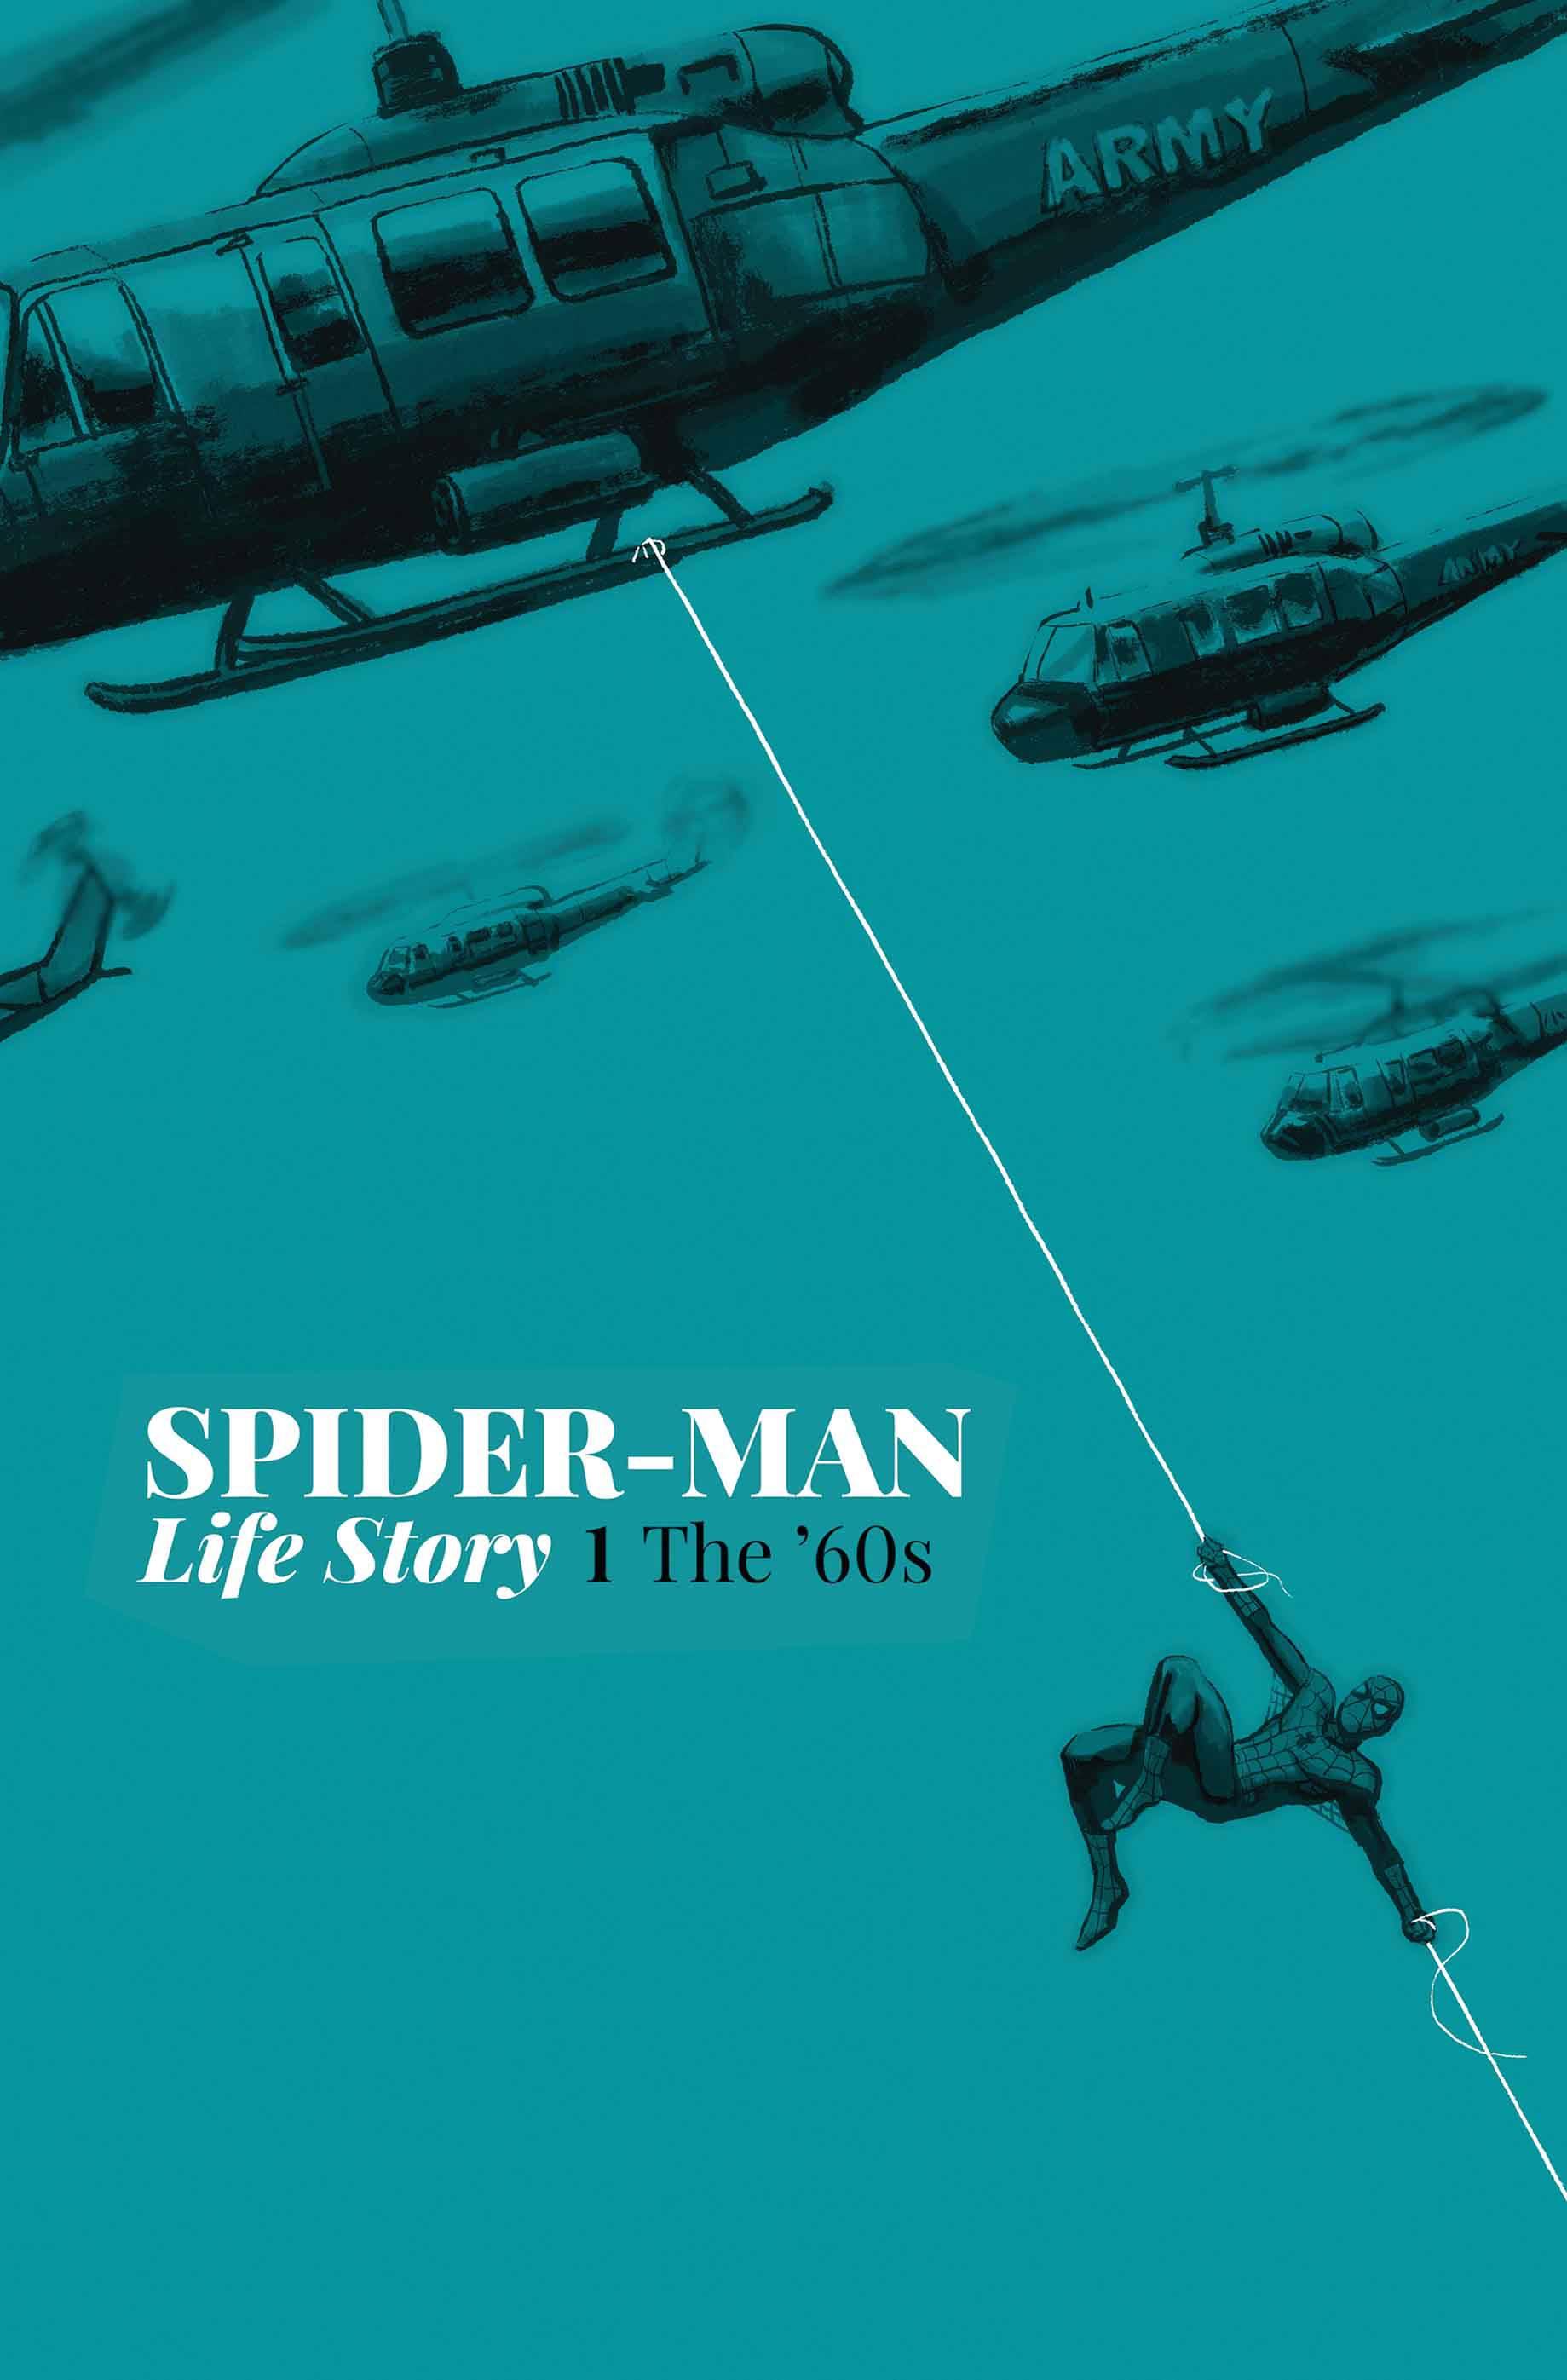 SPIDER-MAN LIFE STORY #1